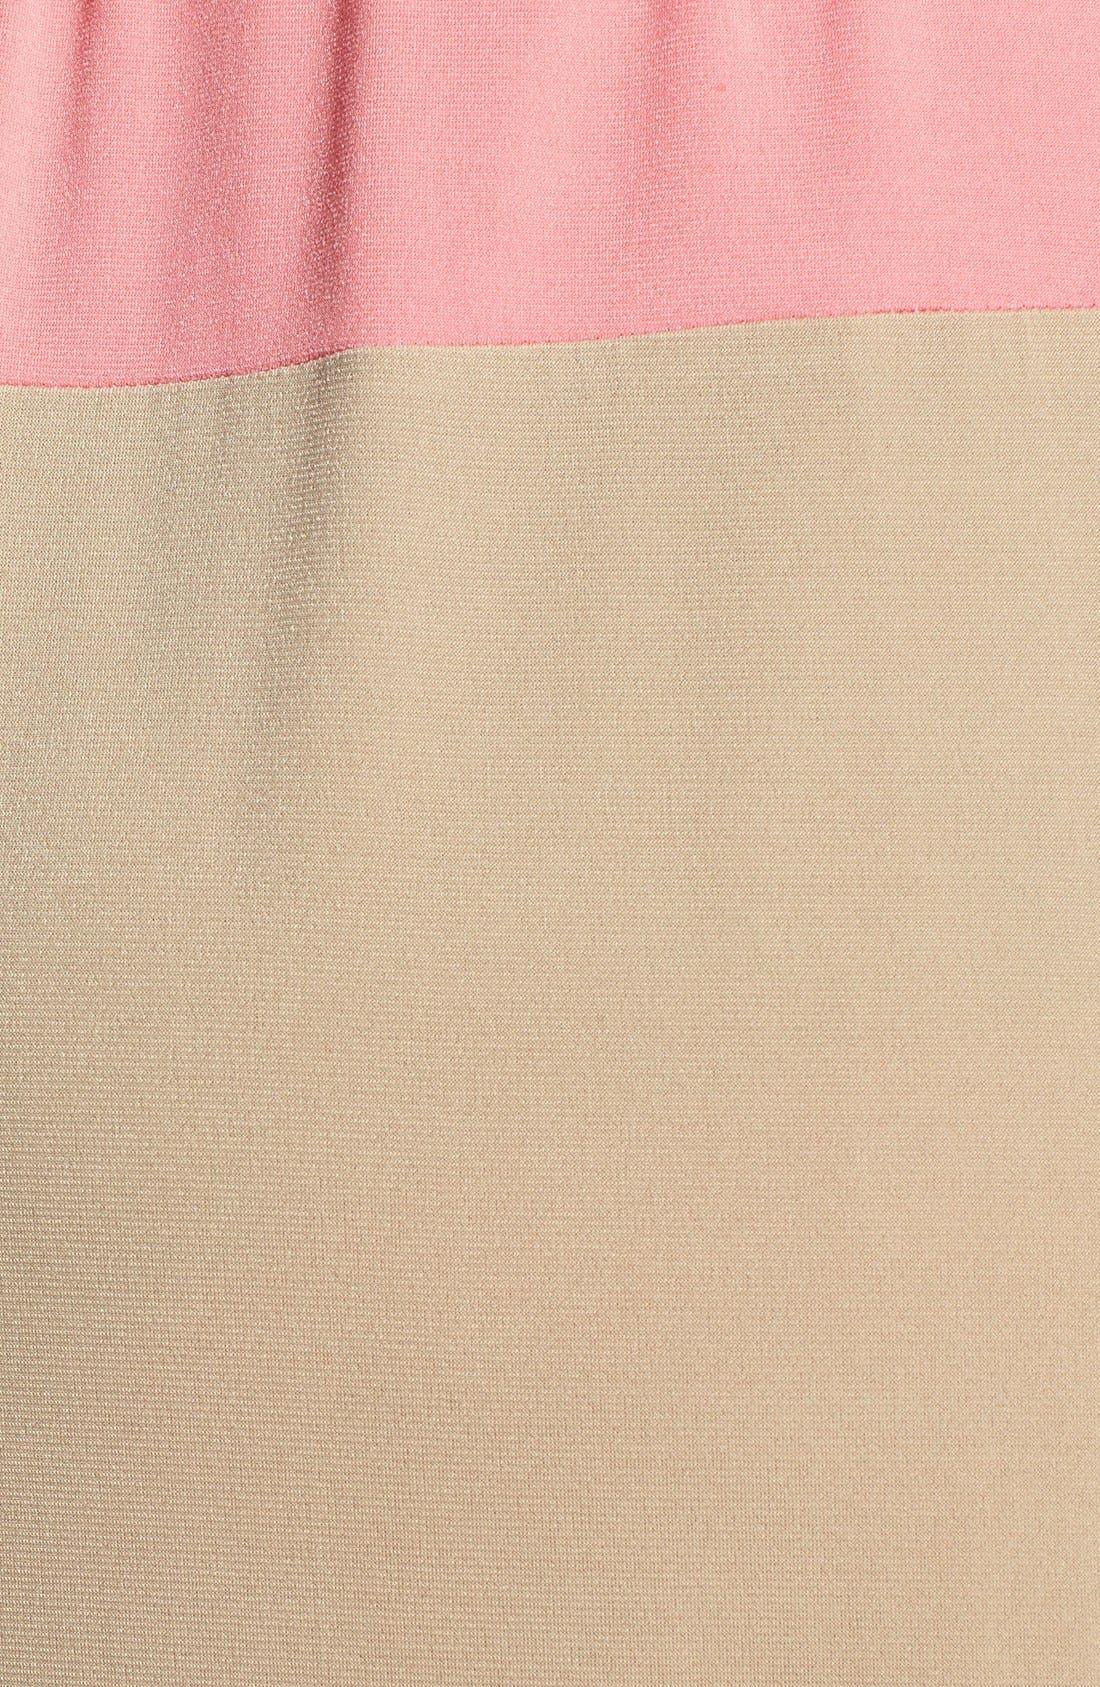 Alternate Image 3  - London Times Colorblock Print Matte Jersey Maxi Dress (Plus Size)